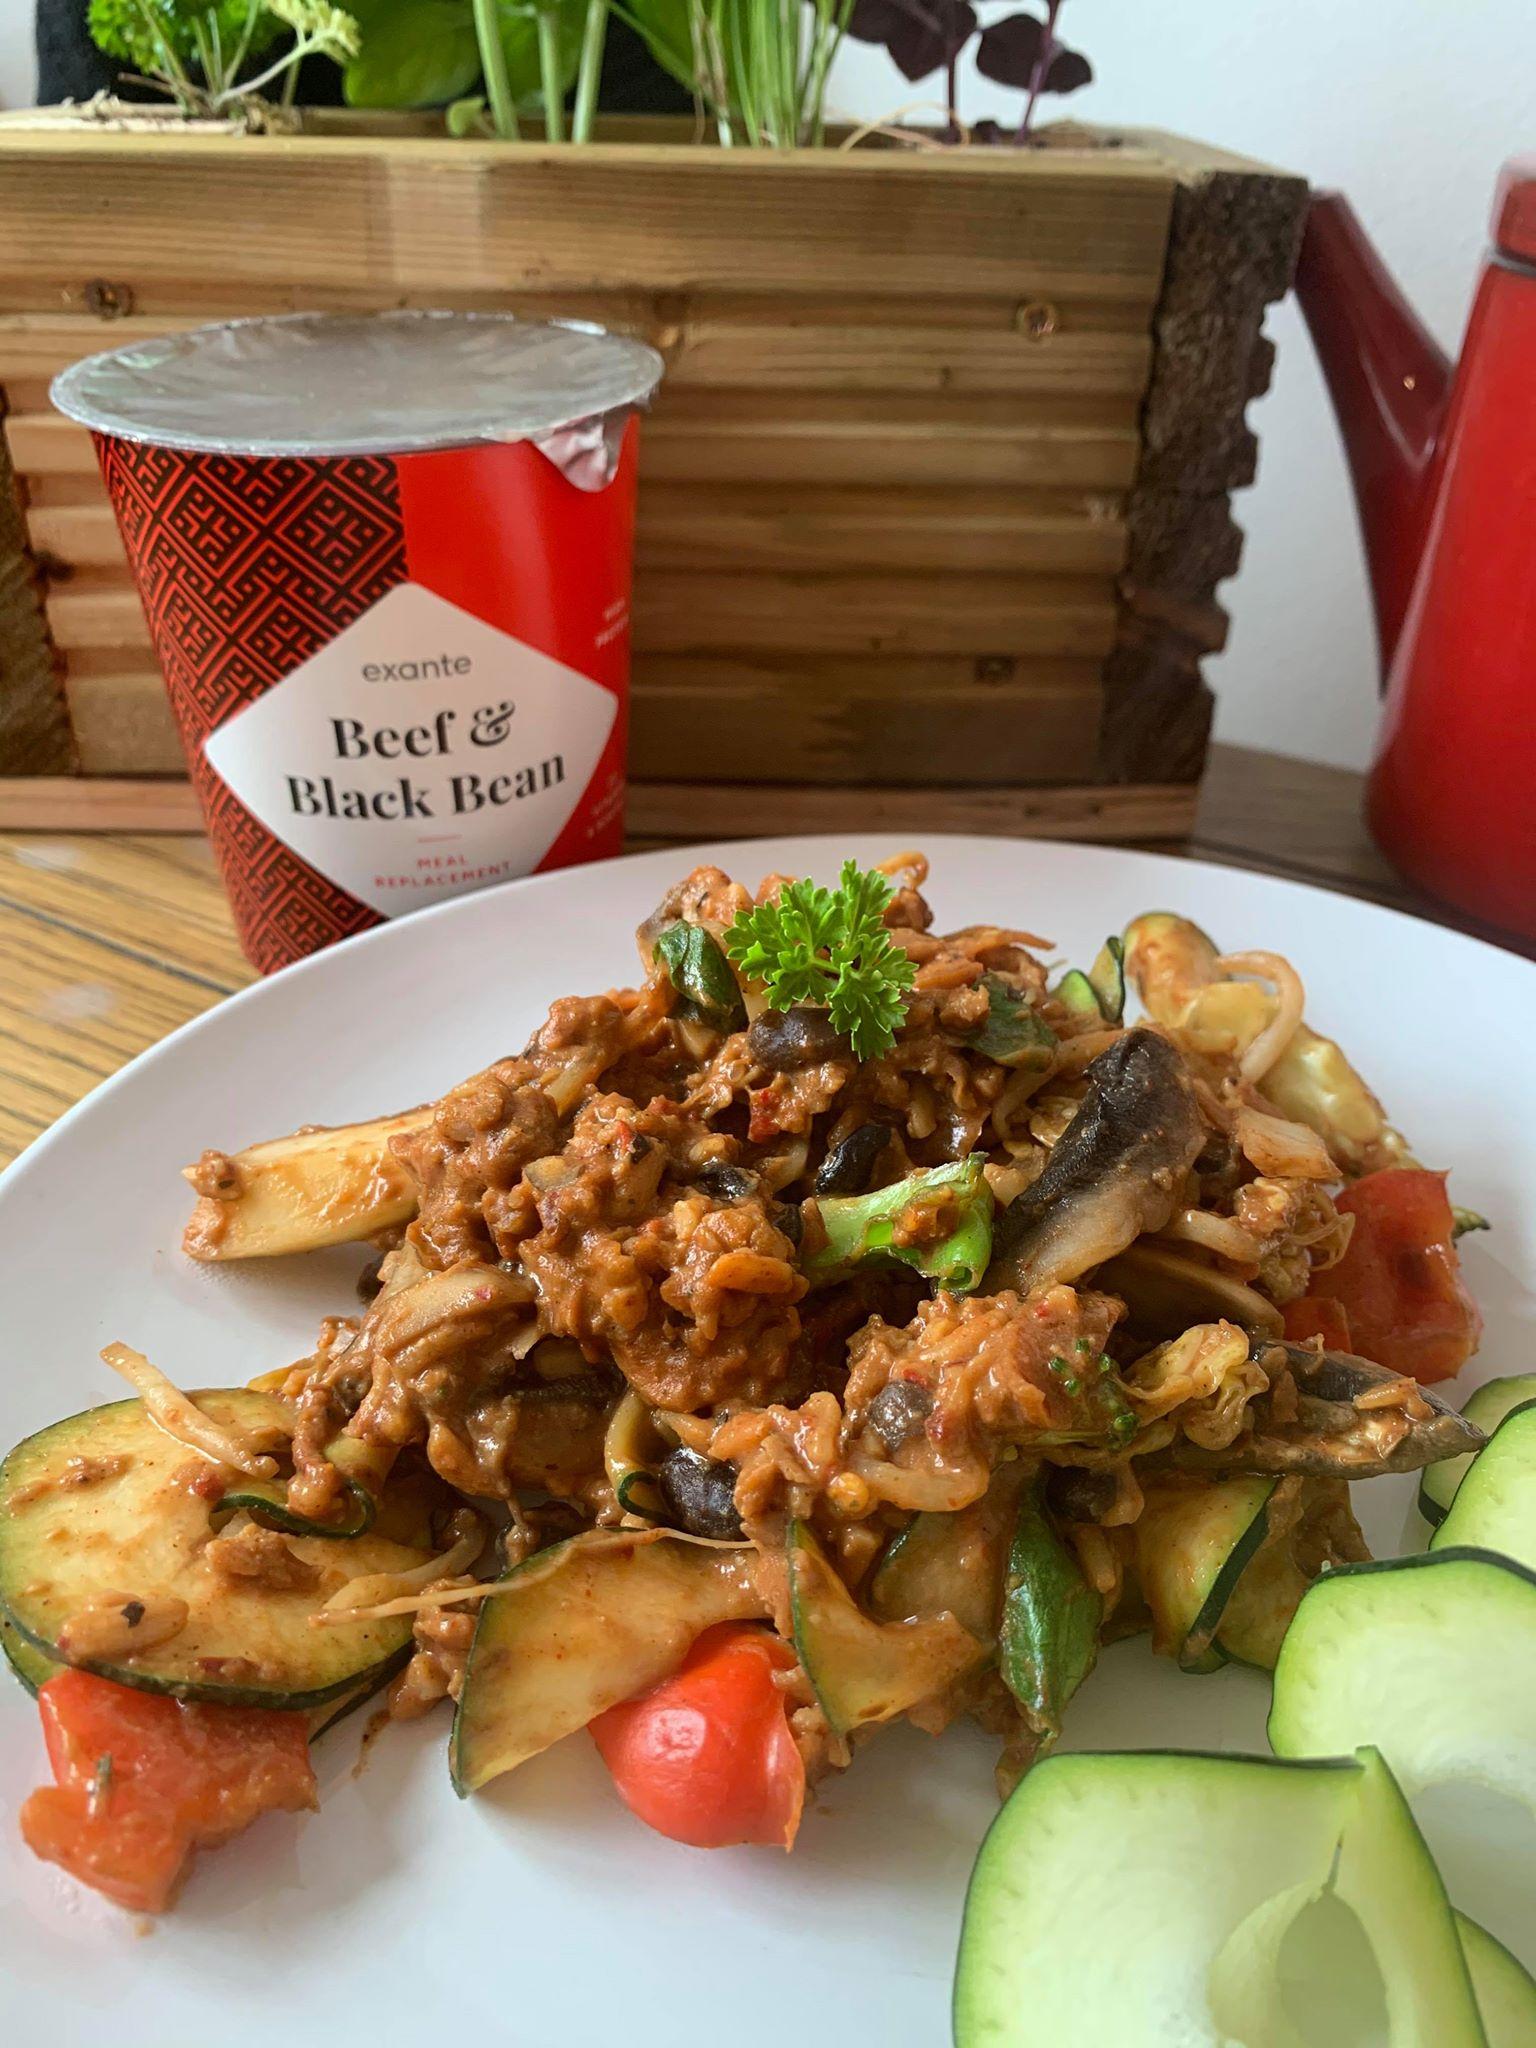 Beef & Black Bean Stir Fry